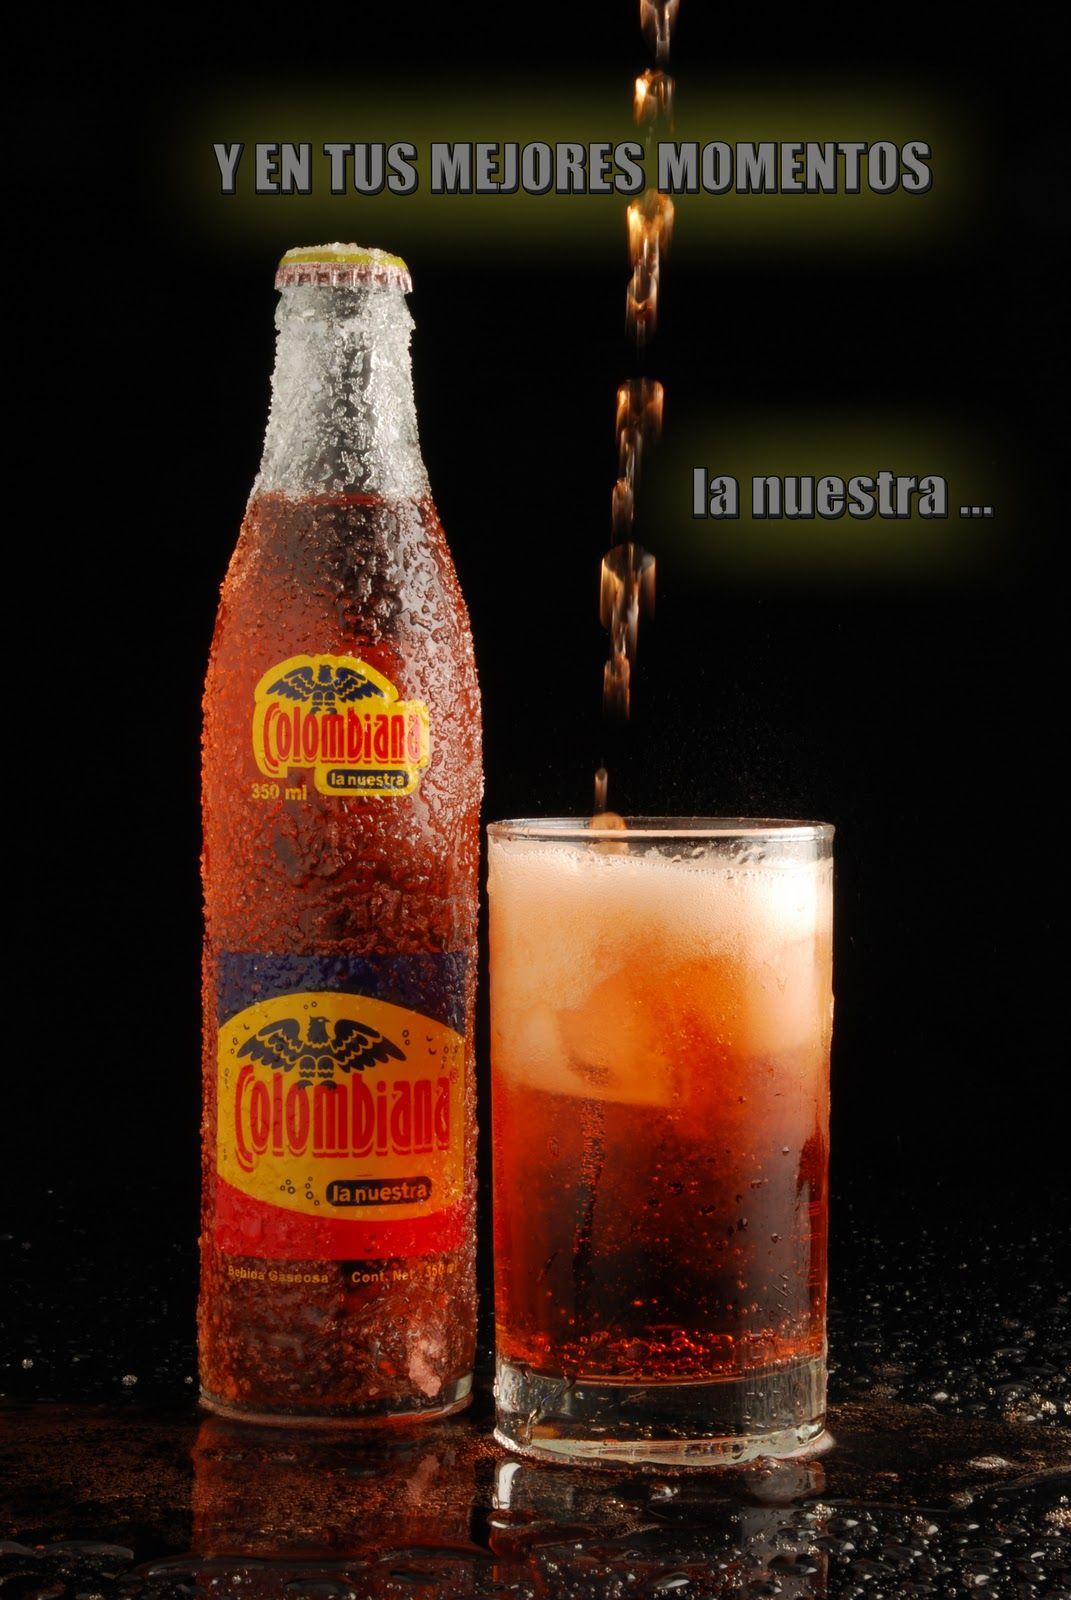 Nuestra Gaseosa Colombiana Colombian Food Corona Beer Bottle